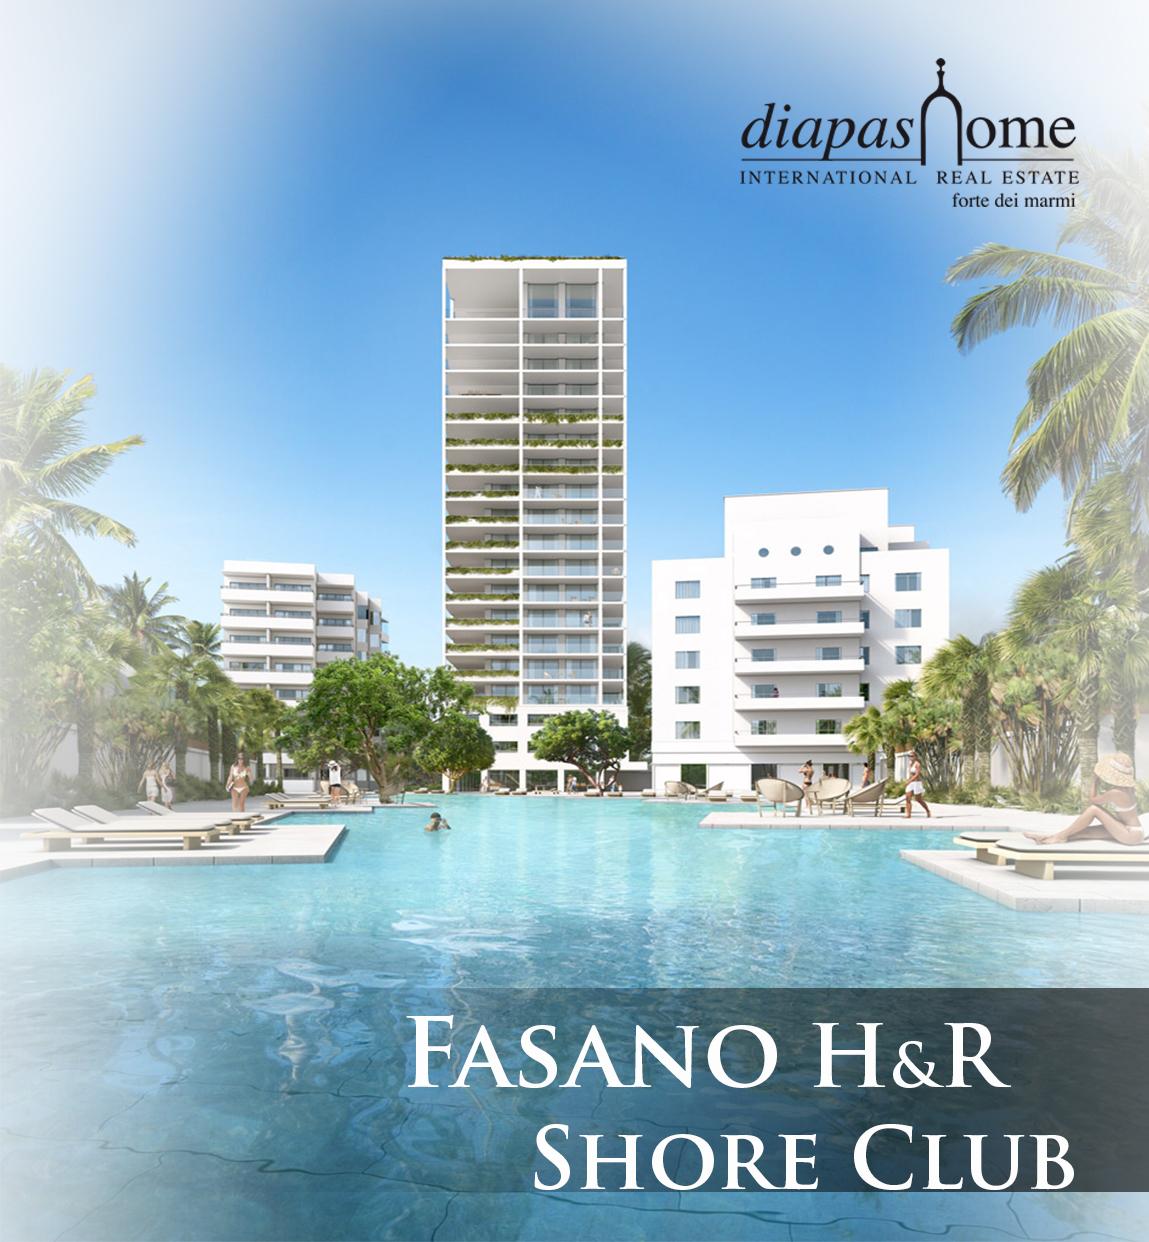 fasano hotel & residences